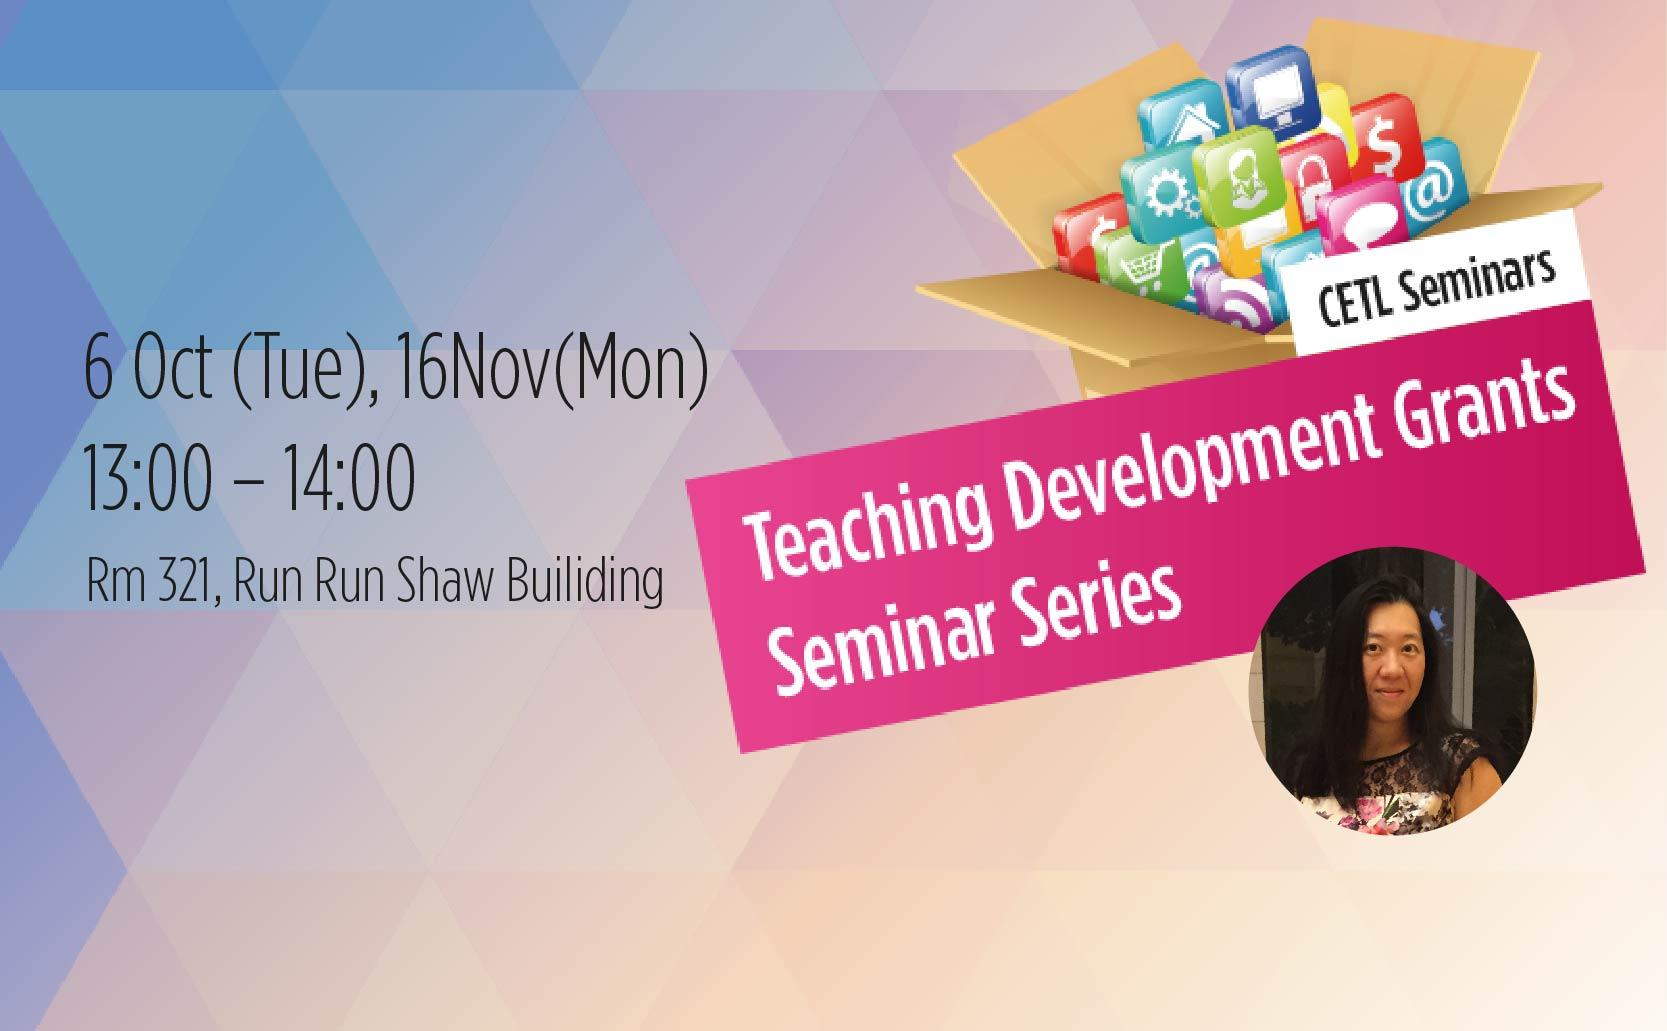 Teaching Development Grants (TDG) Seminar Series